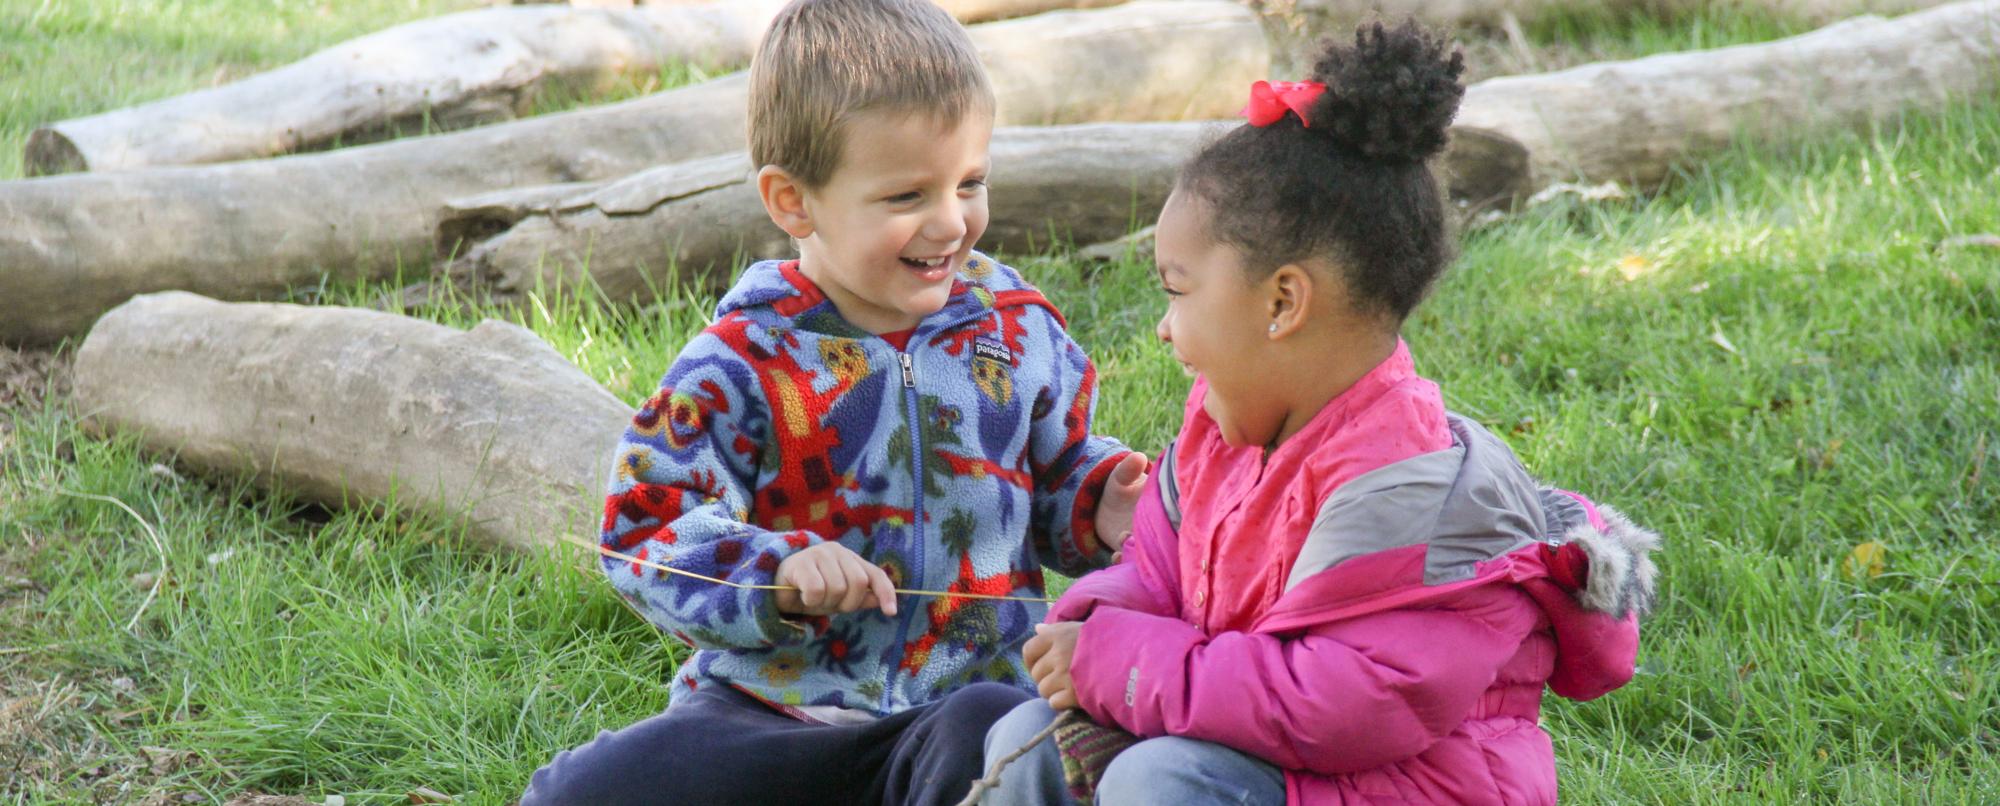 Toddlers - Greenspring Montessori School